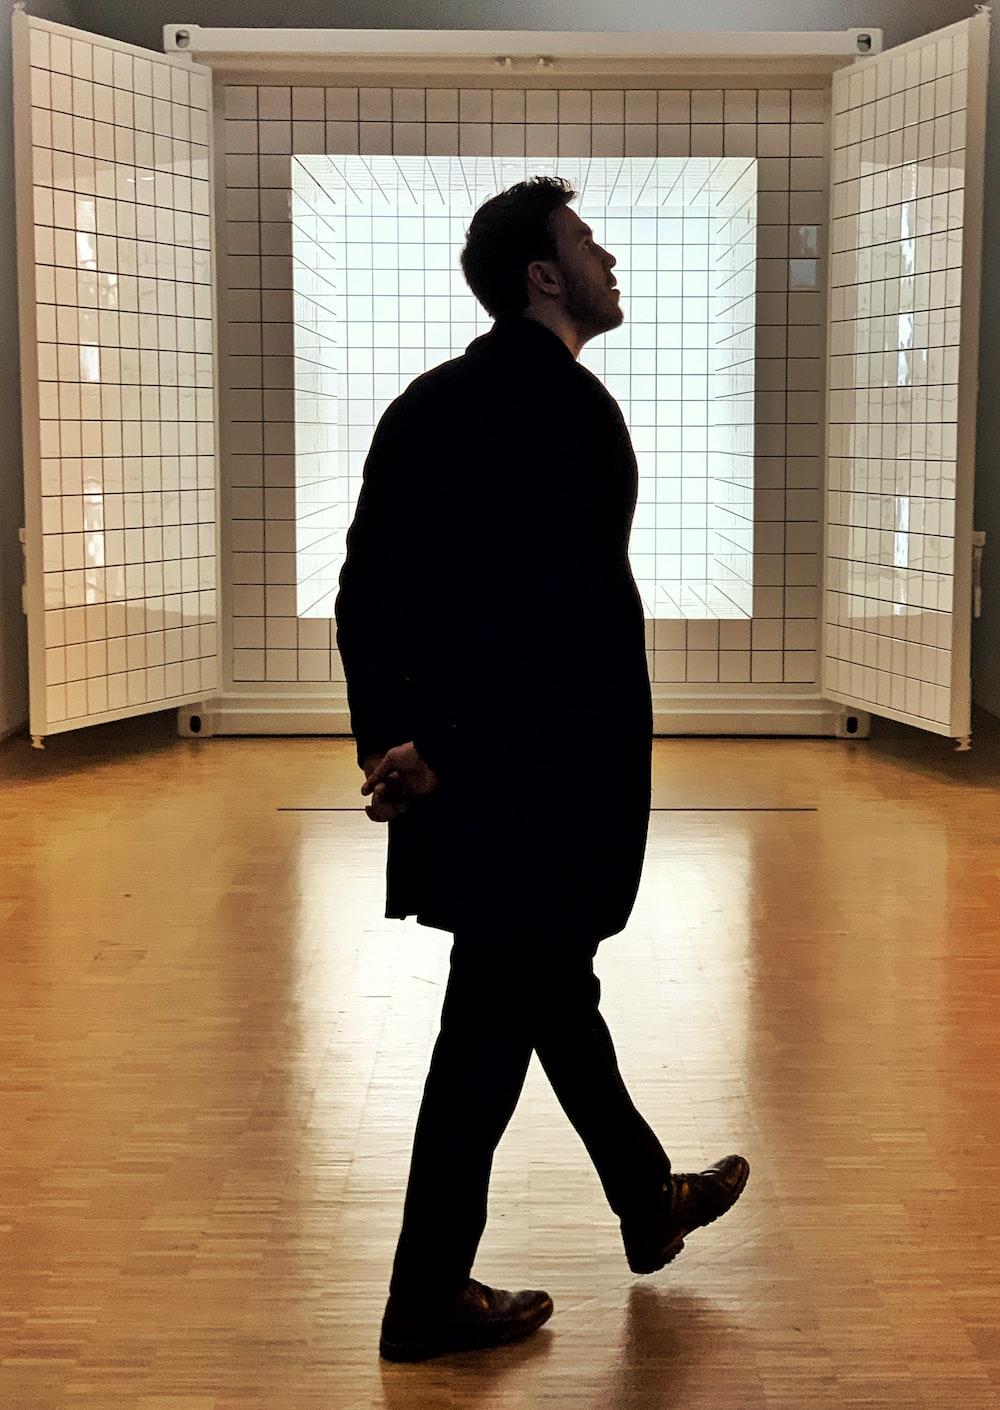 man in black coat standing inside room